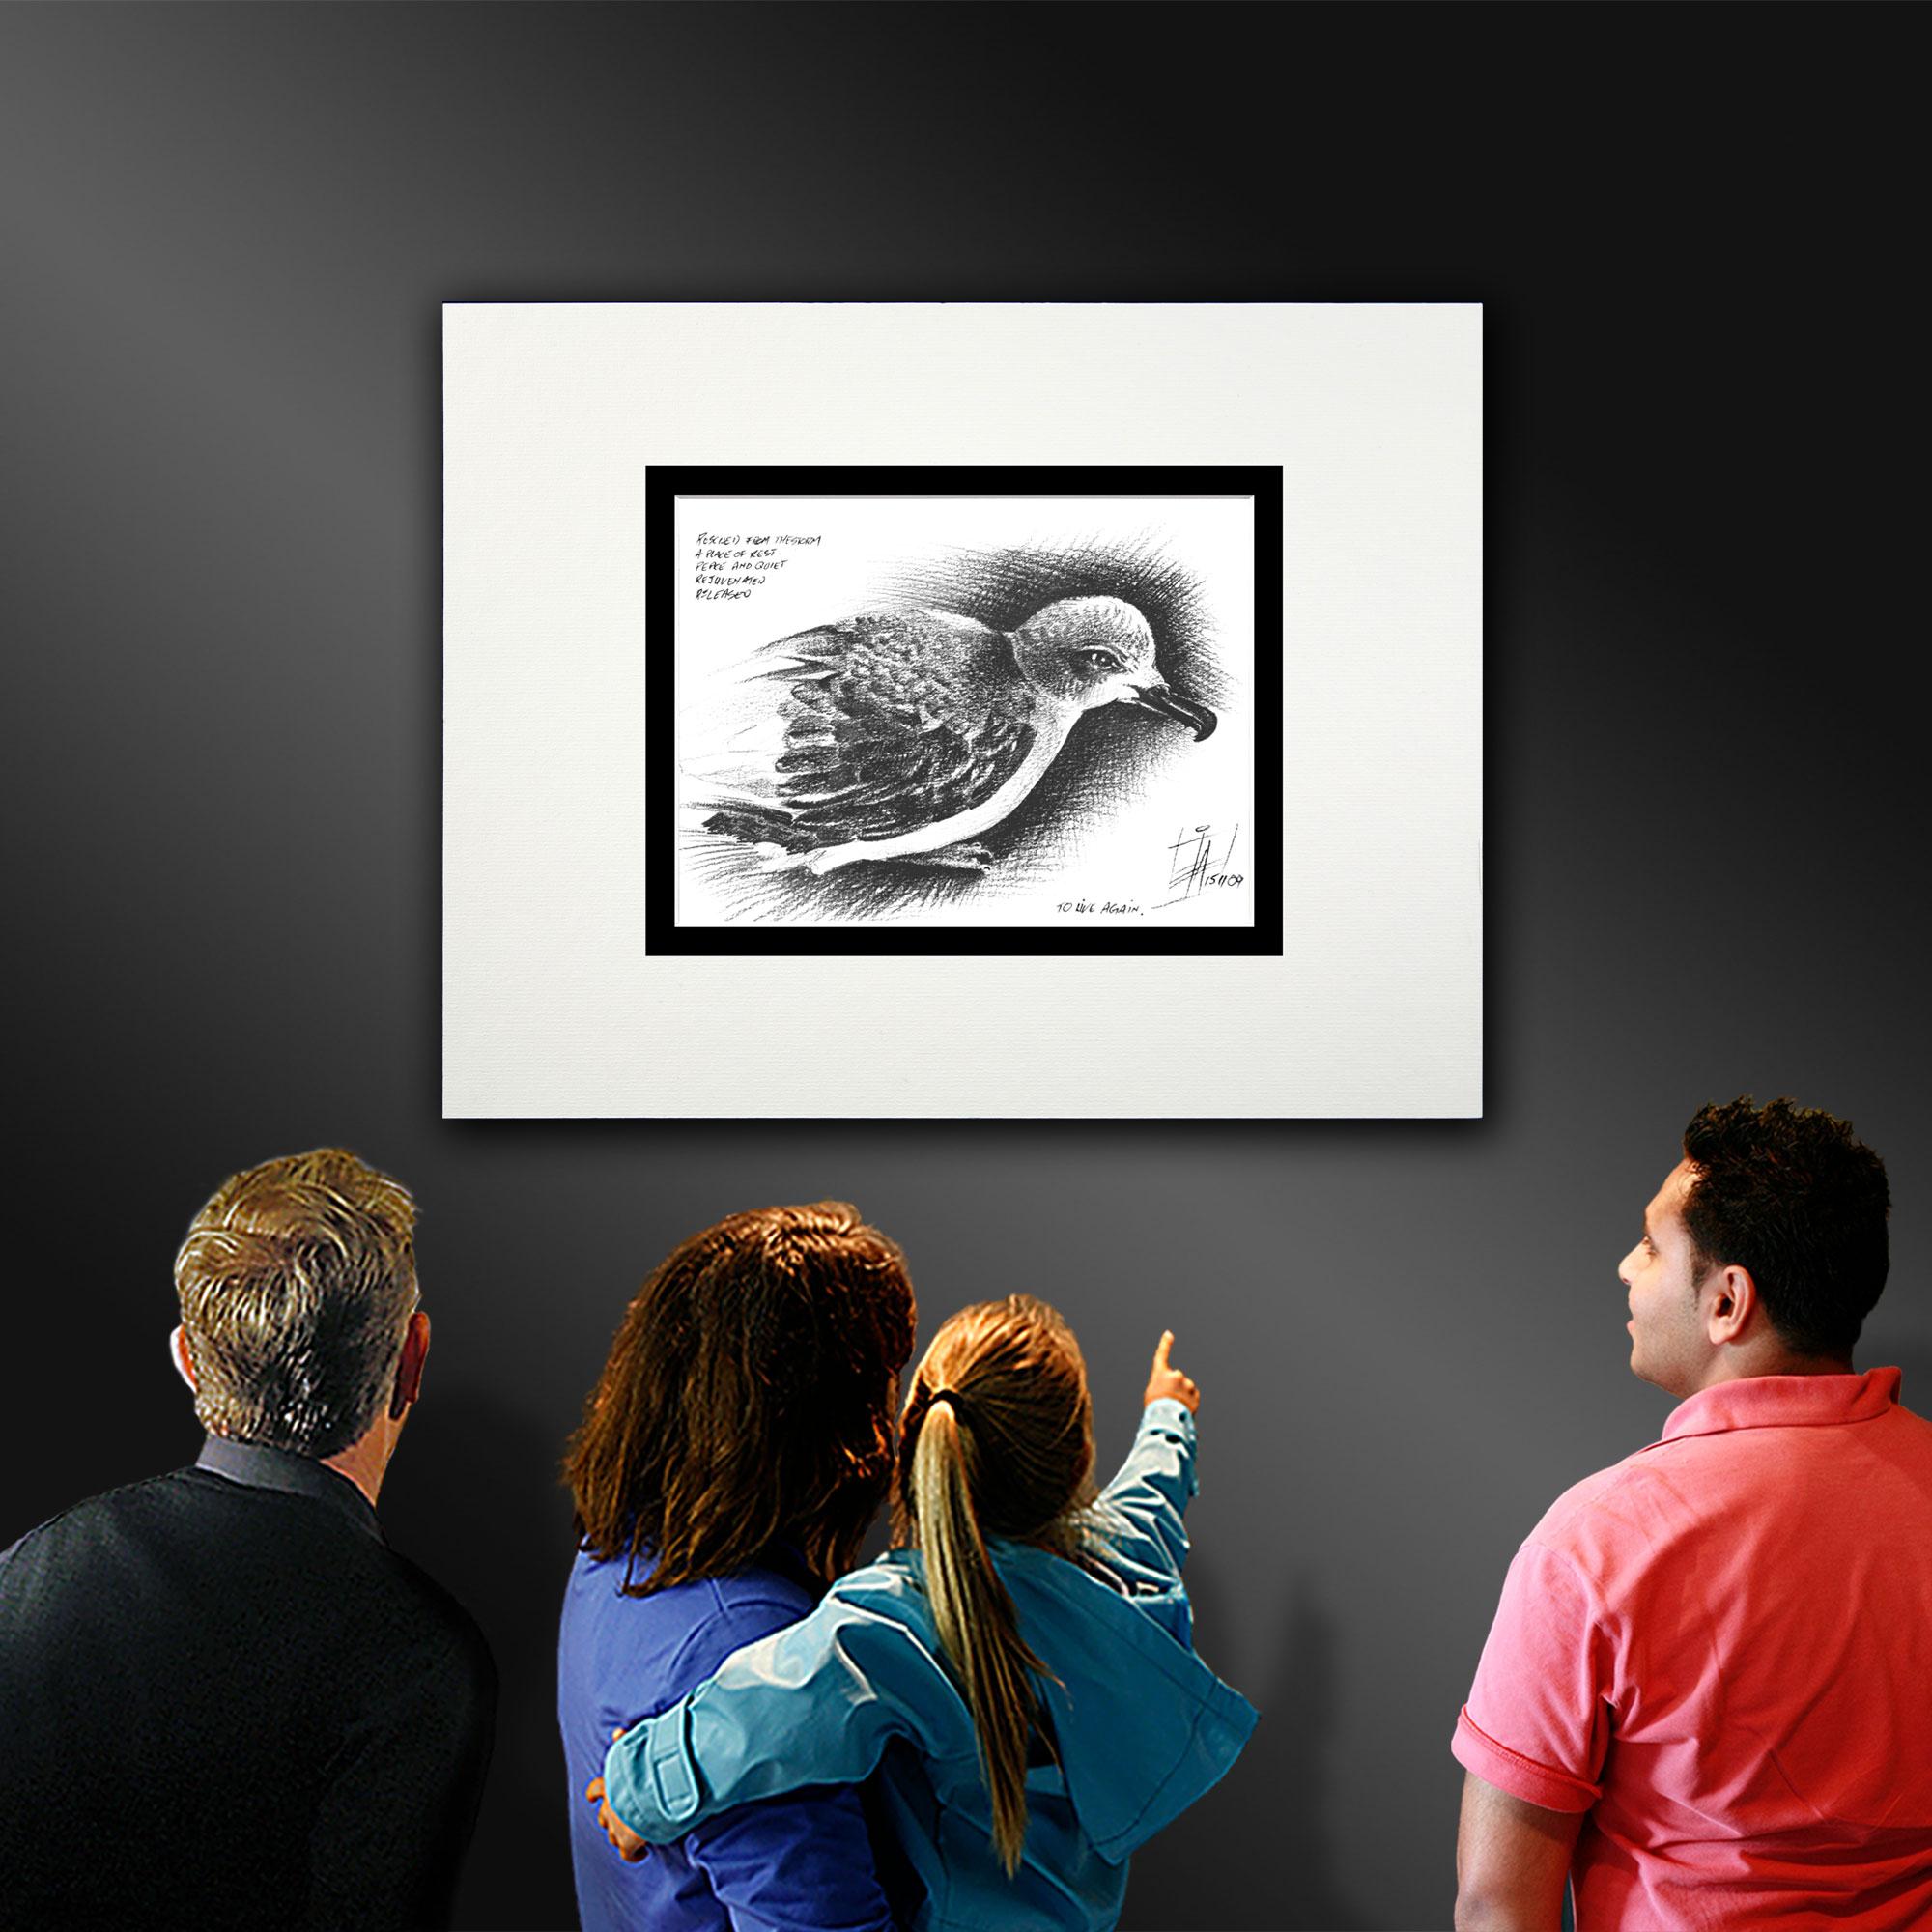 A pencil illustration of a resting Storm Petrel gallery display